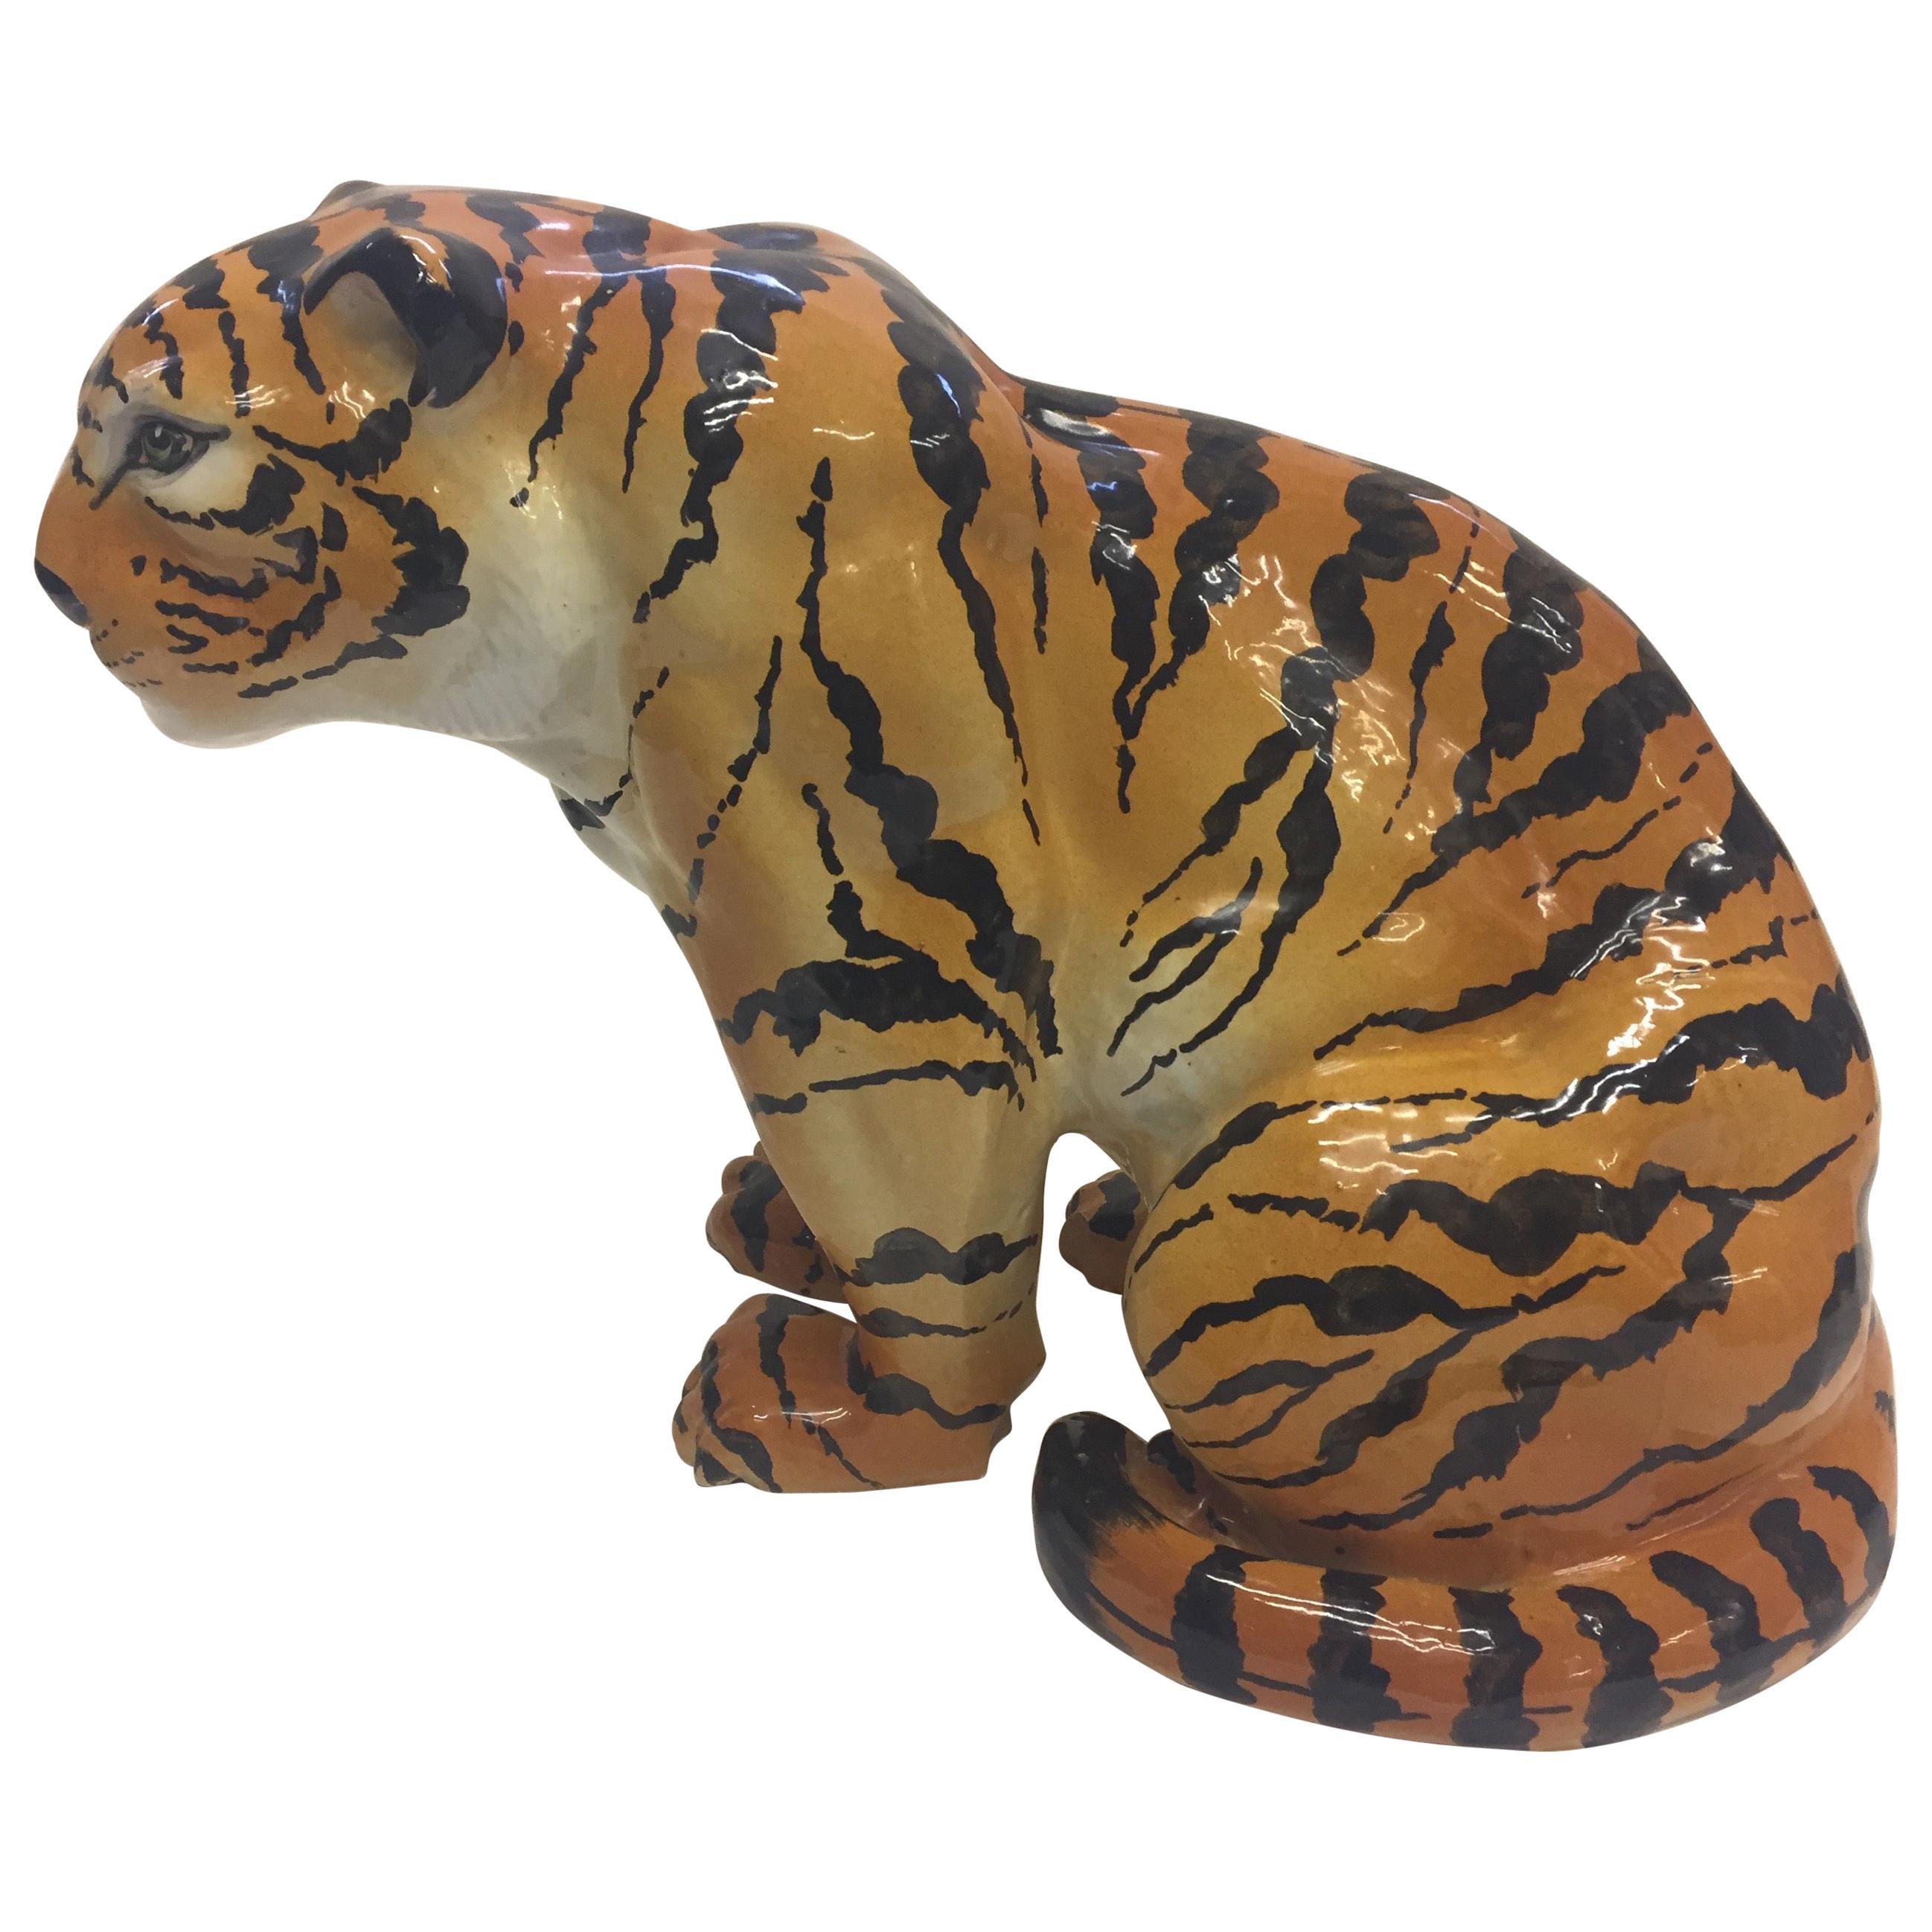 Italian Terracotta Seated Tiger Sculpture